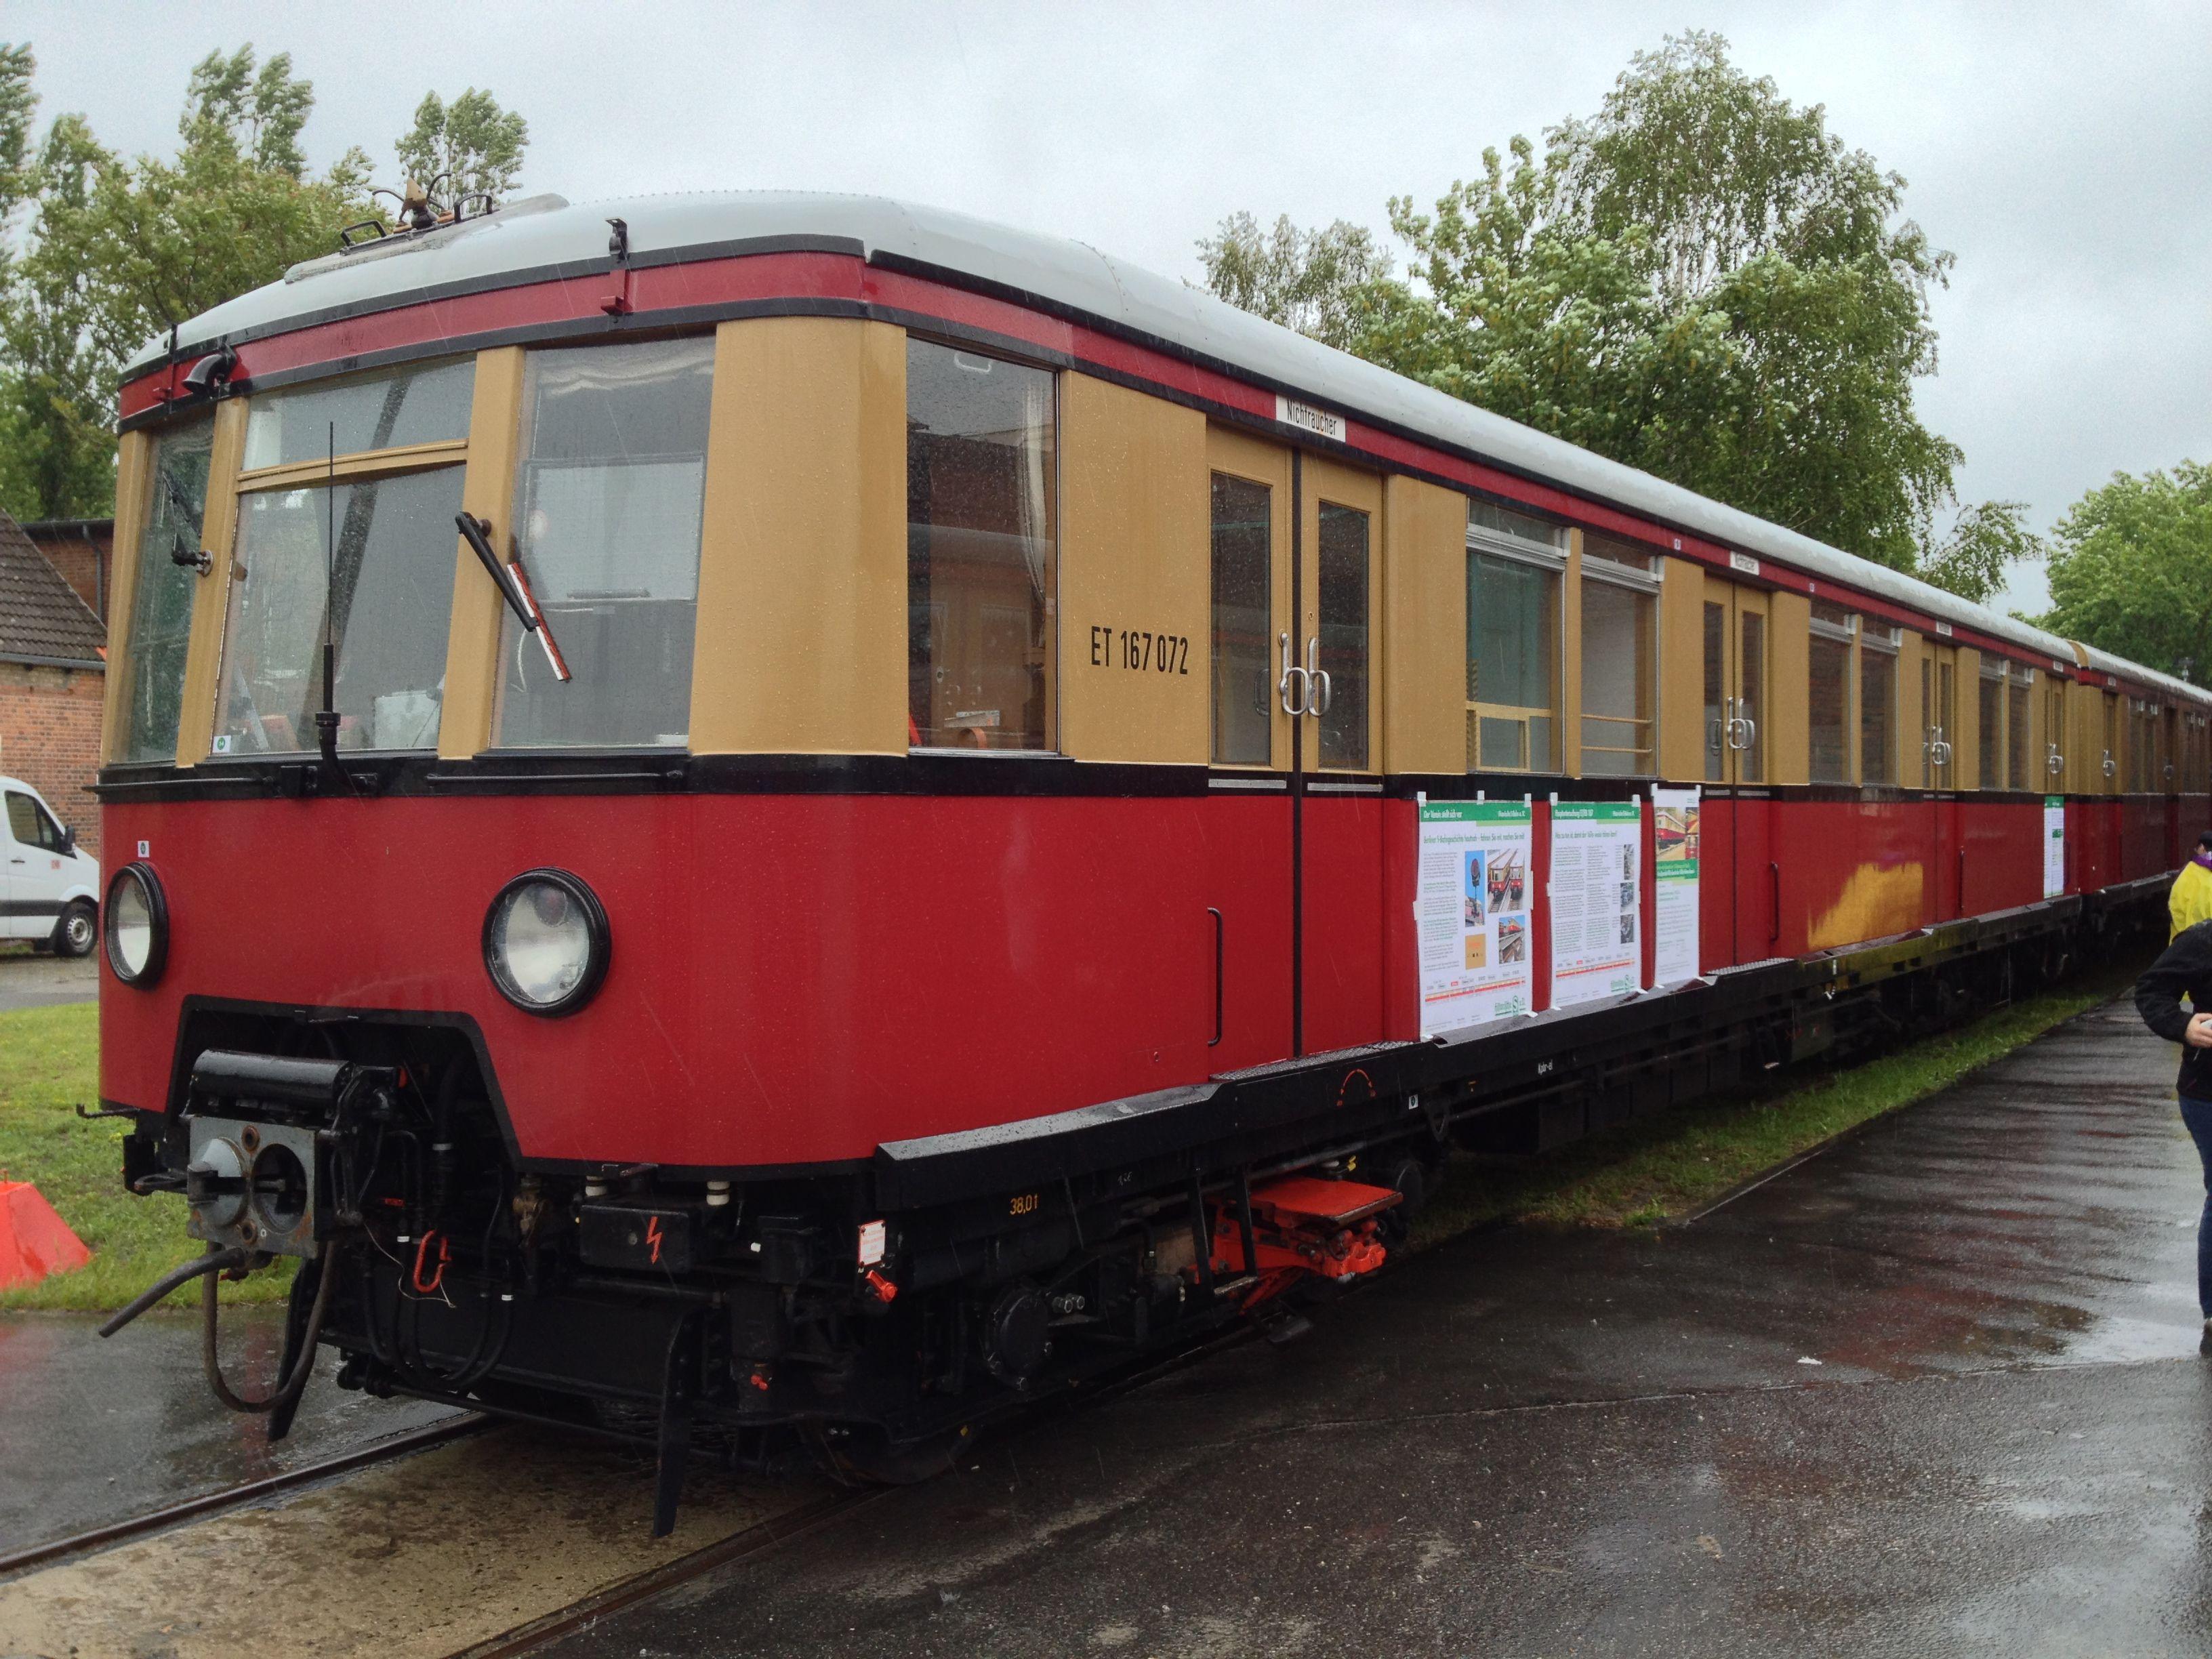 S-Bahn 167 072, Bauart 1938/1941, ex 277 087, Baureihe 167, Erkner, Juni 2013